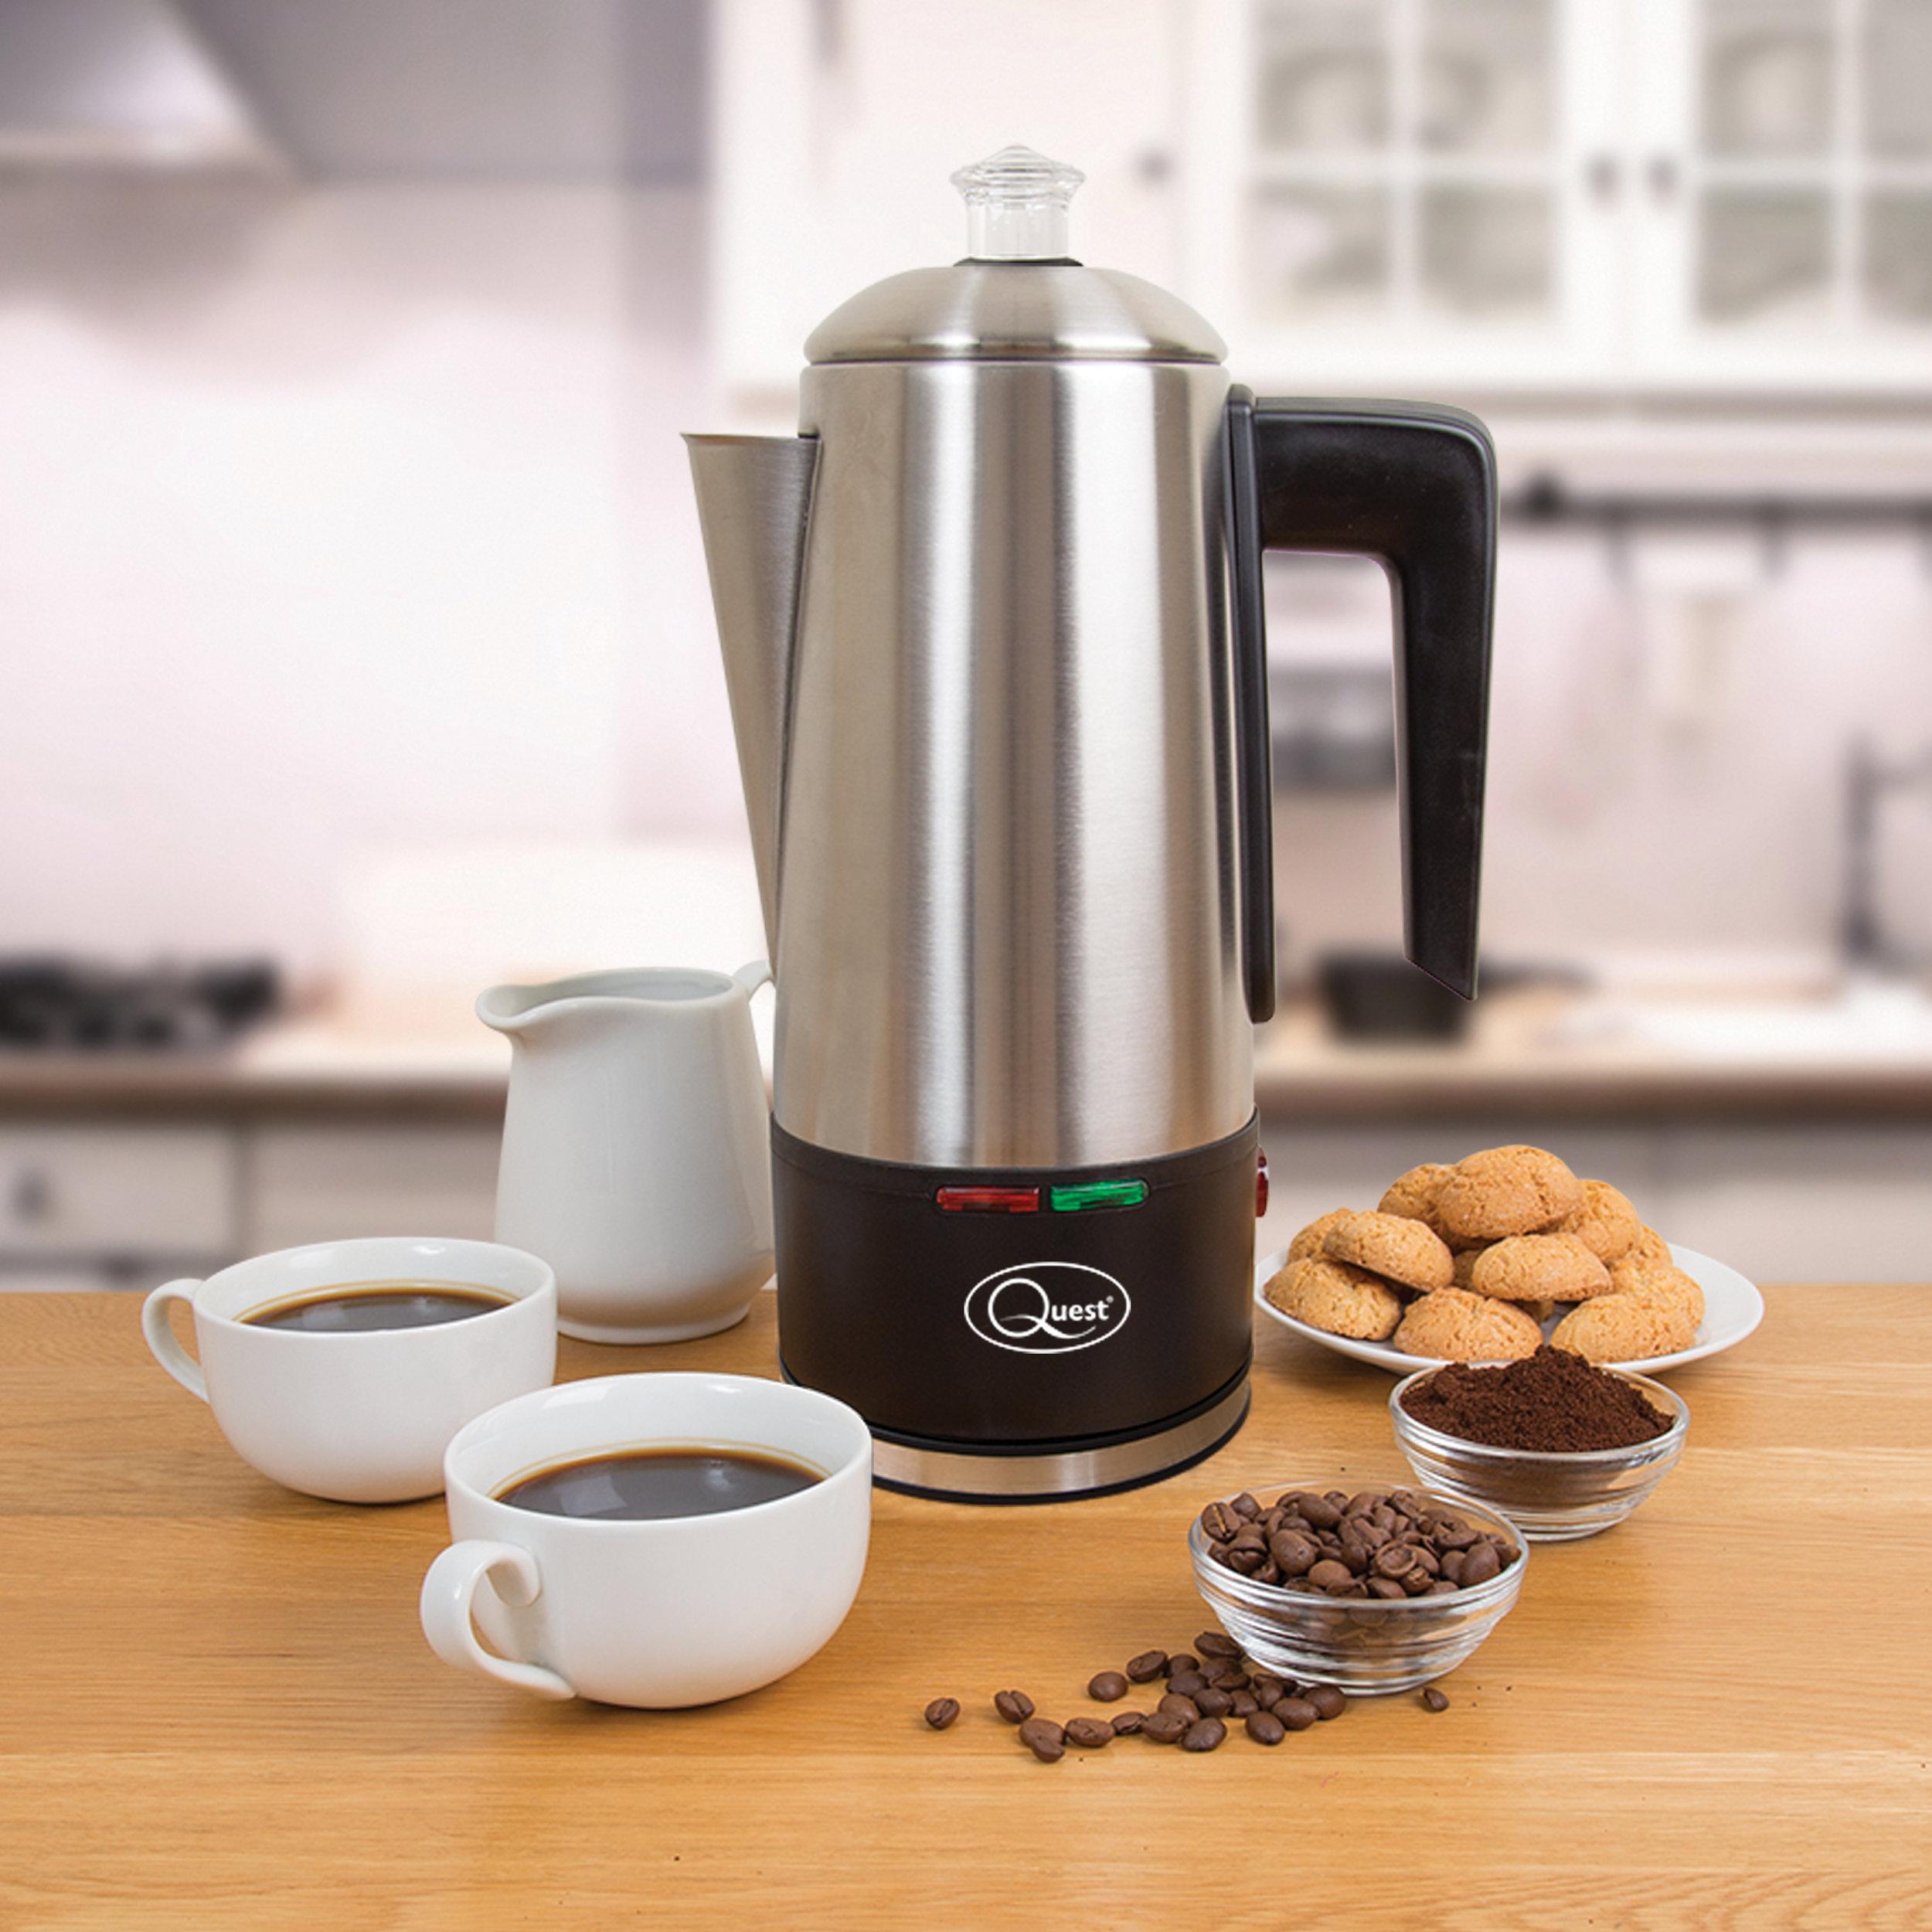 Electric Coffee Percolator Quest Home